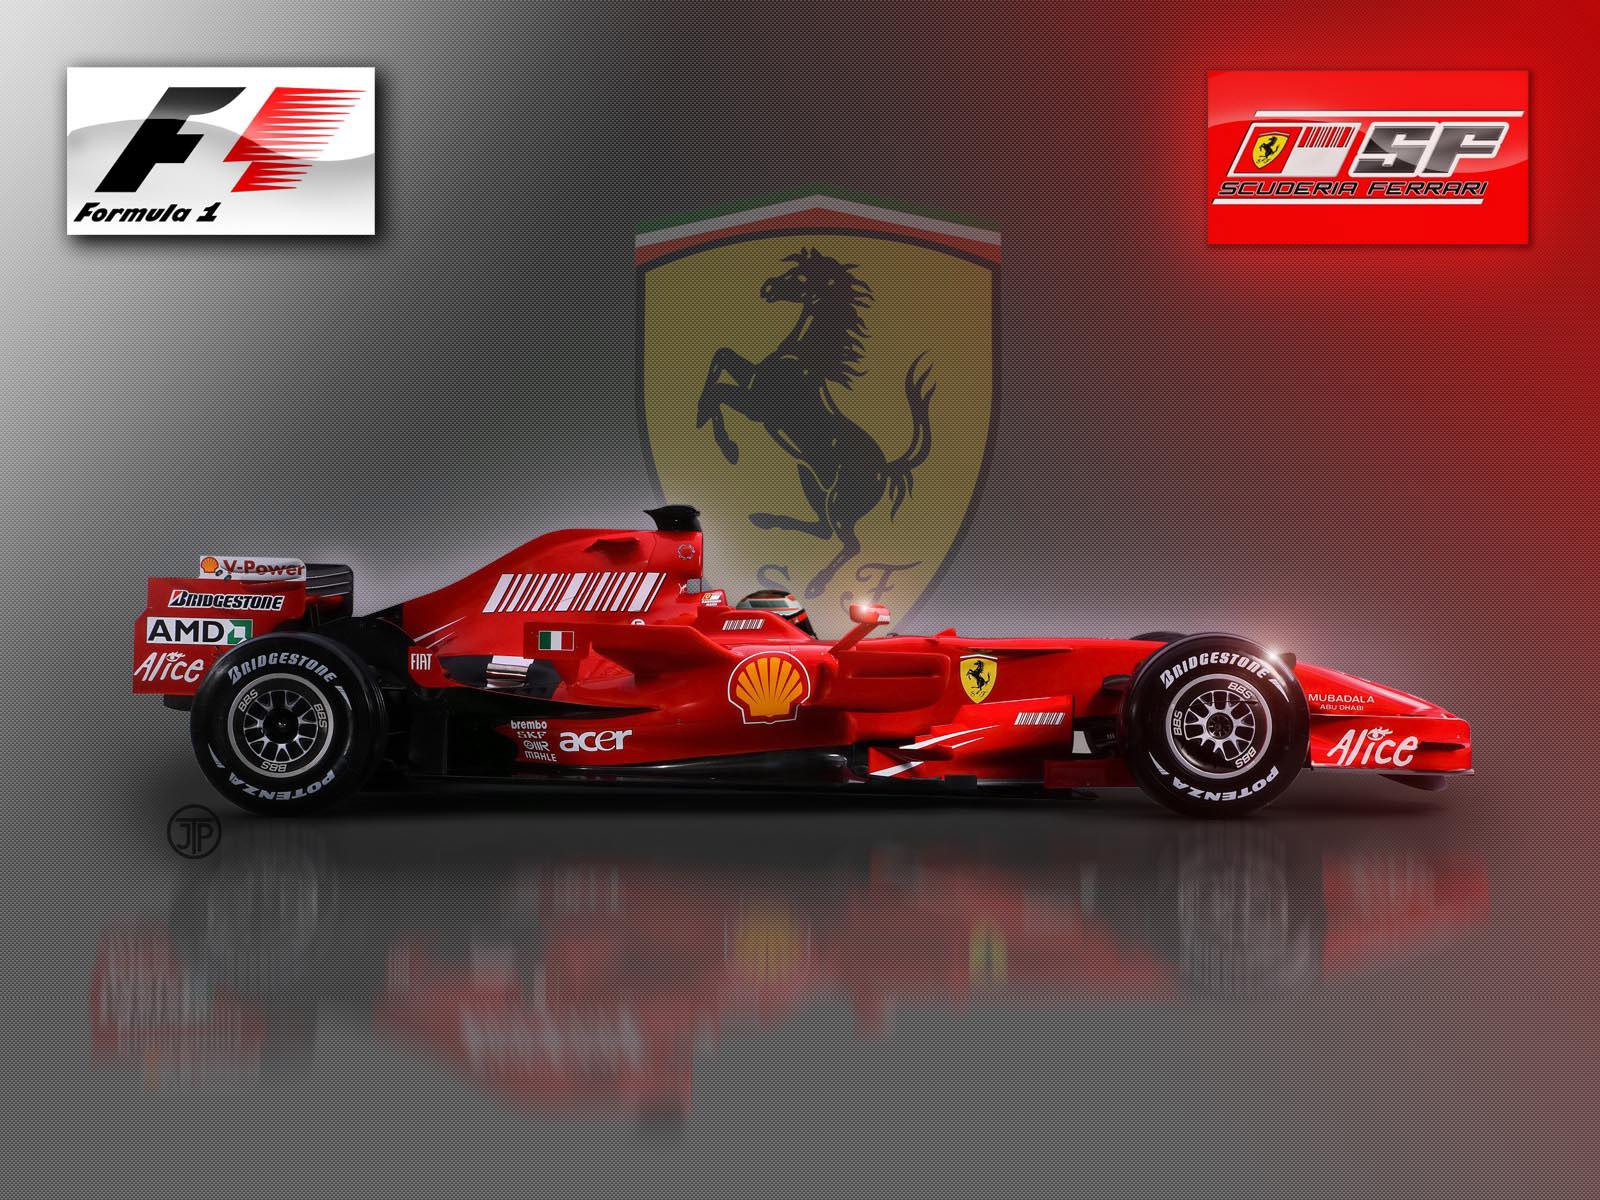 Ferrari F1 Wallpapers Vehicles Hq Ferrari F1 Pictures 4k Wallpapers 2019